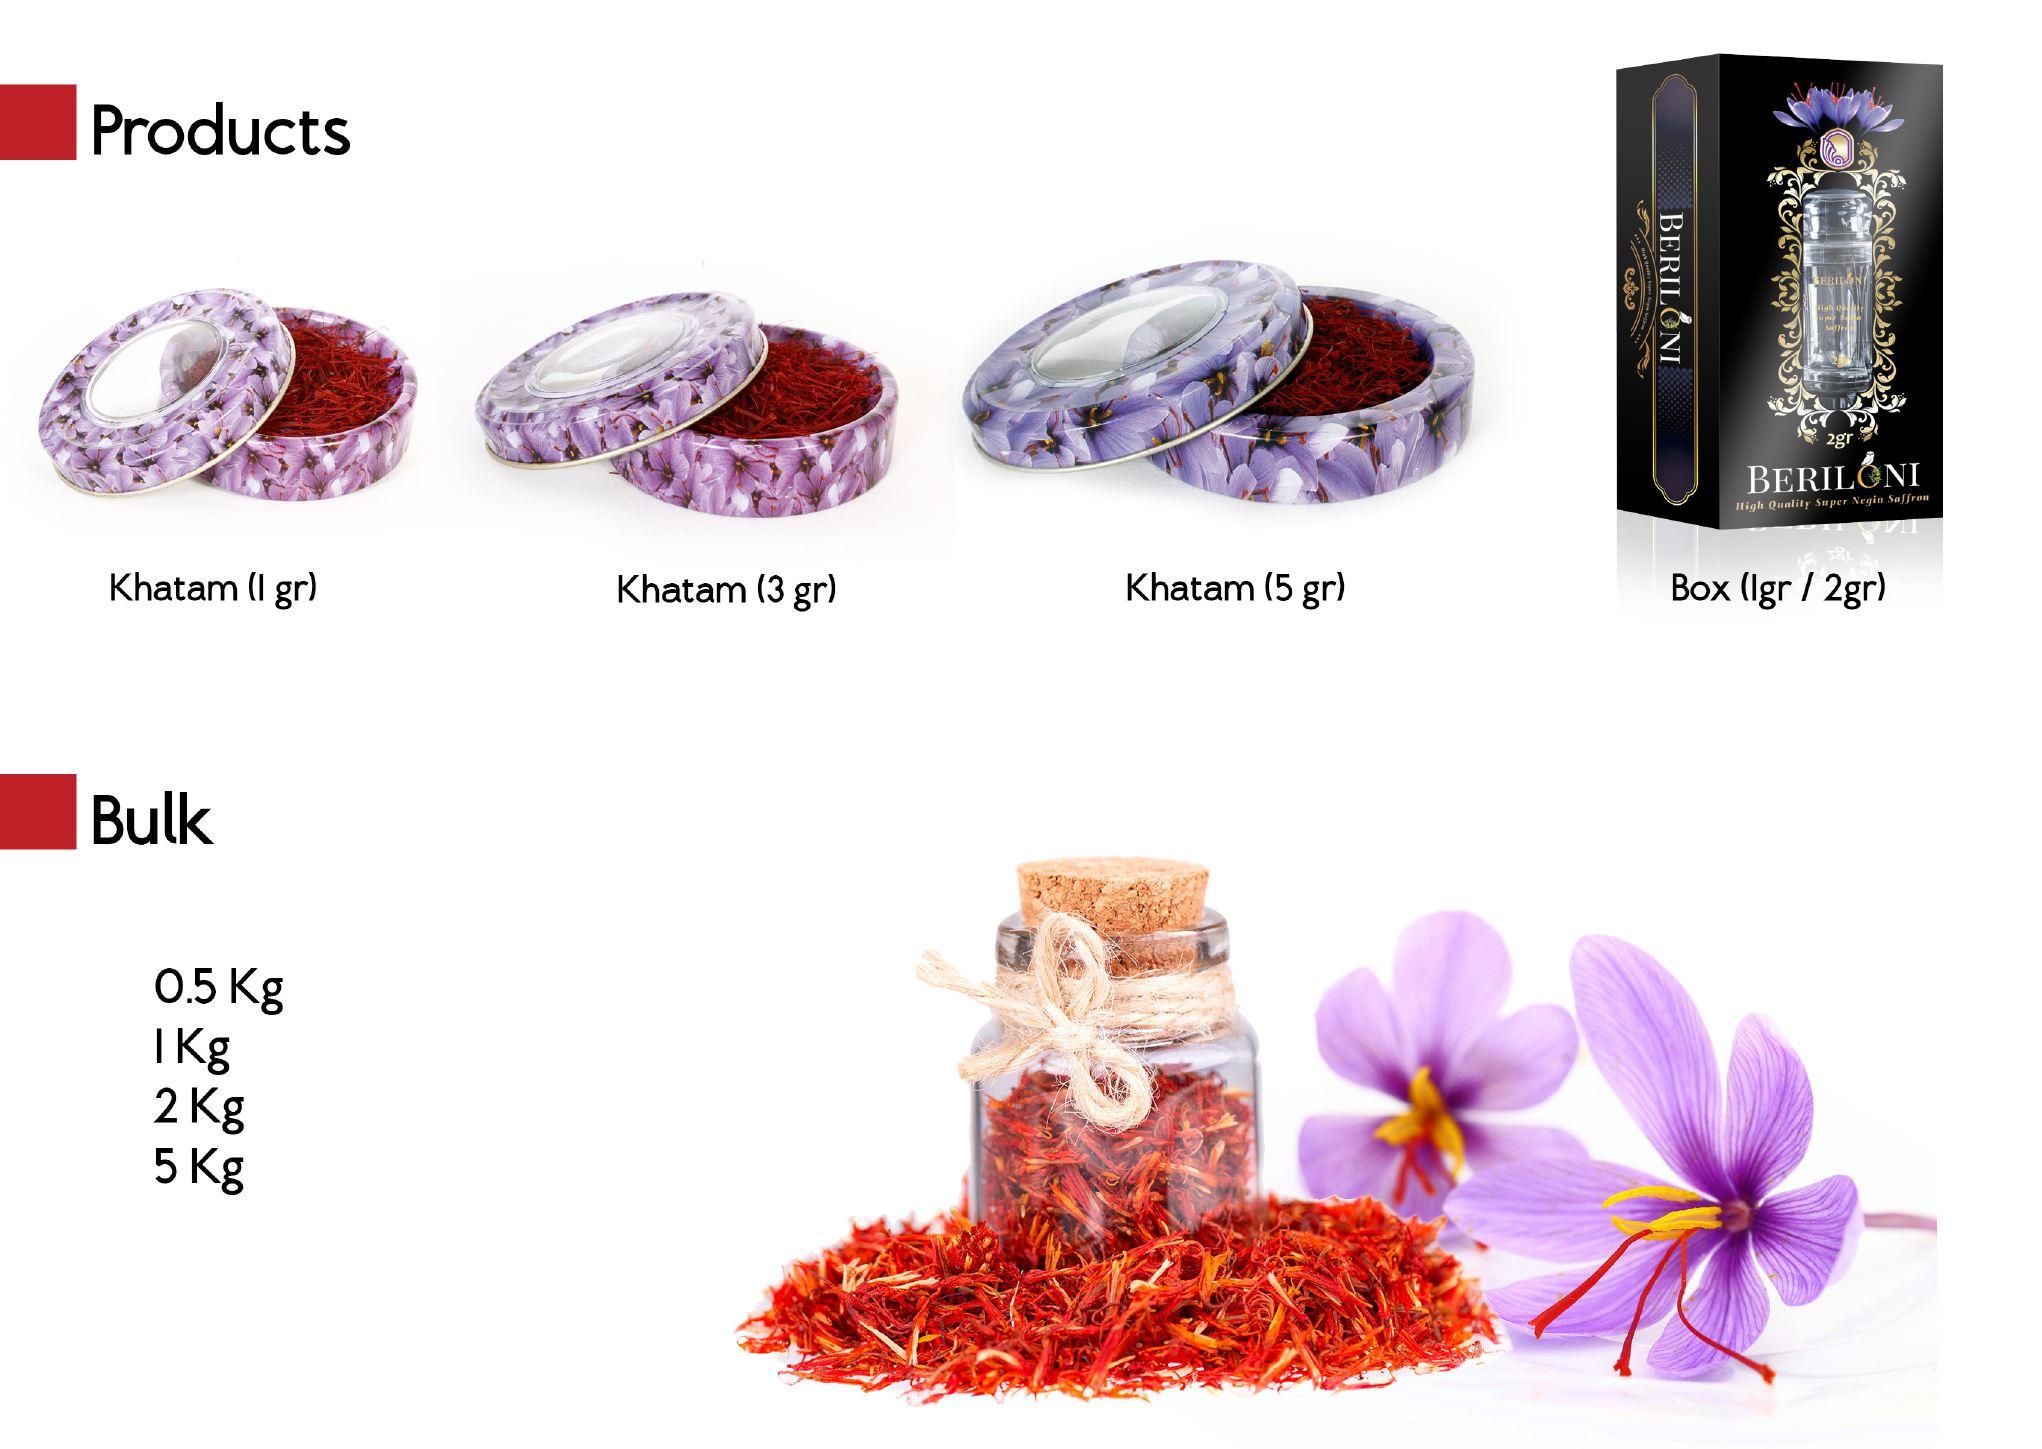 Nhụy Hoa Nghệ Tây Beriloni Saffron loại cao cấp Super Negin (1 Gram) 3